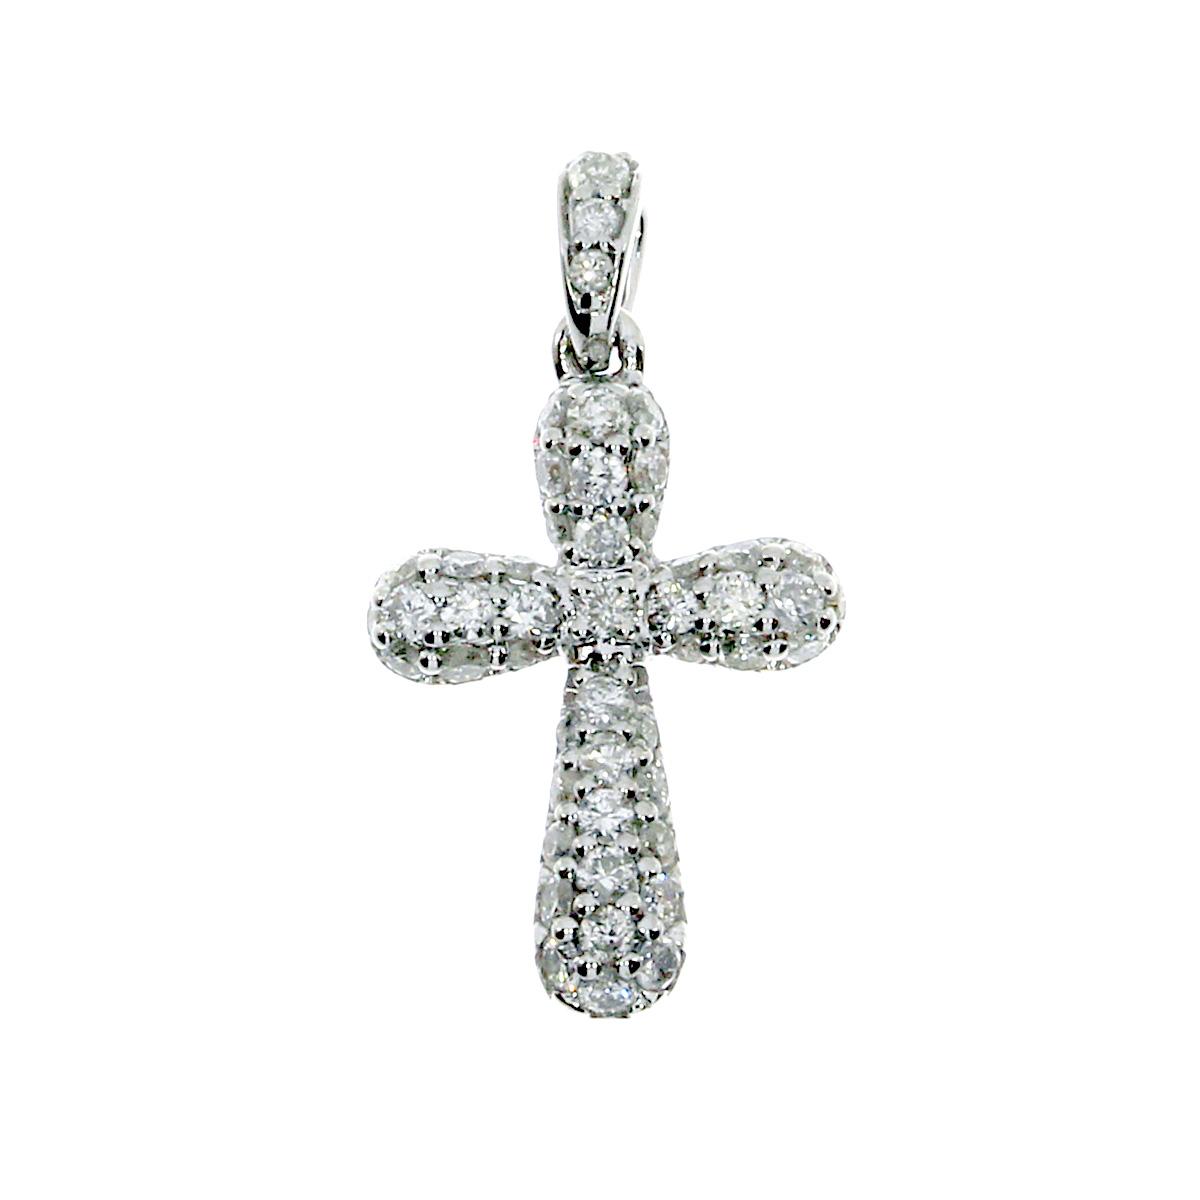 14k white gold cross pendant with shimmering diamonds.